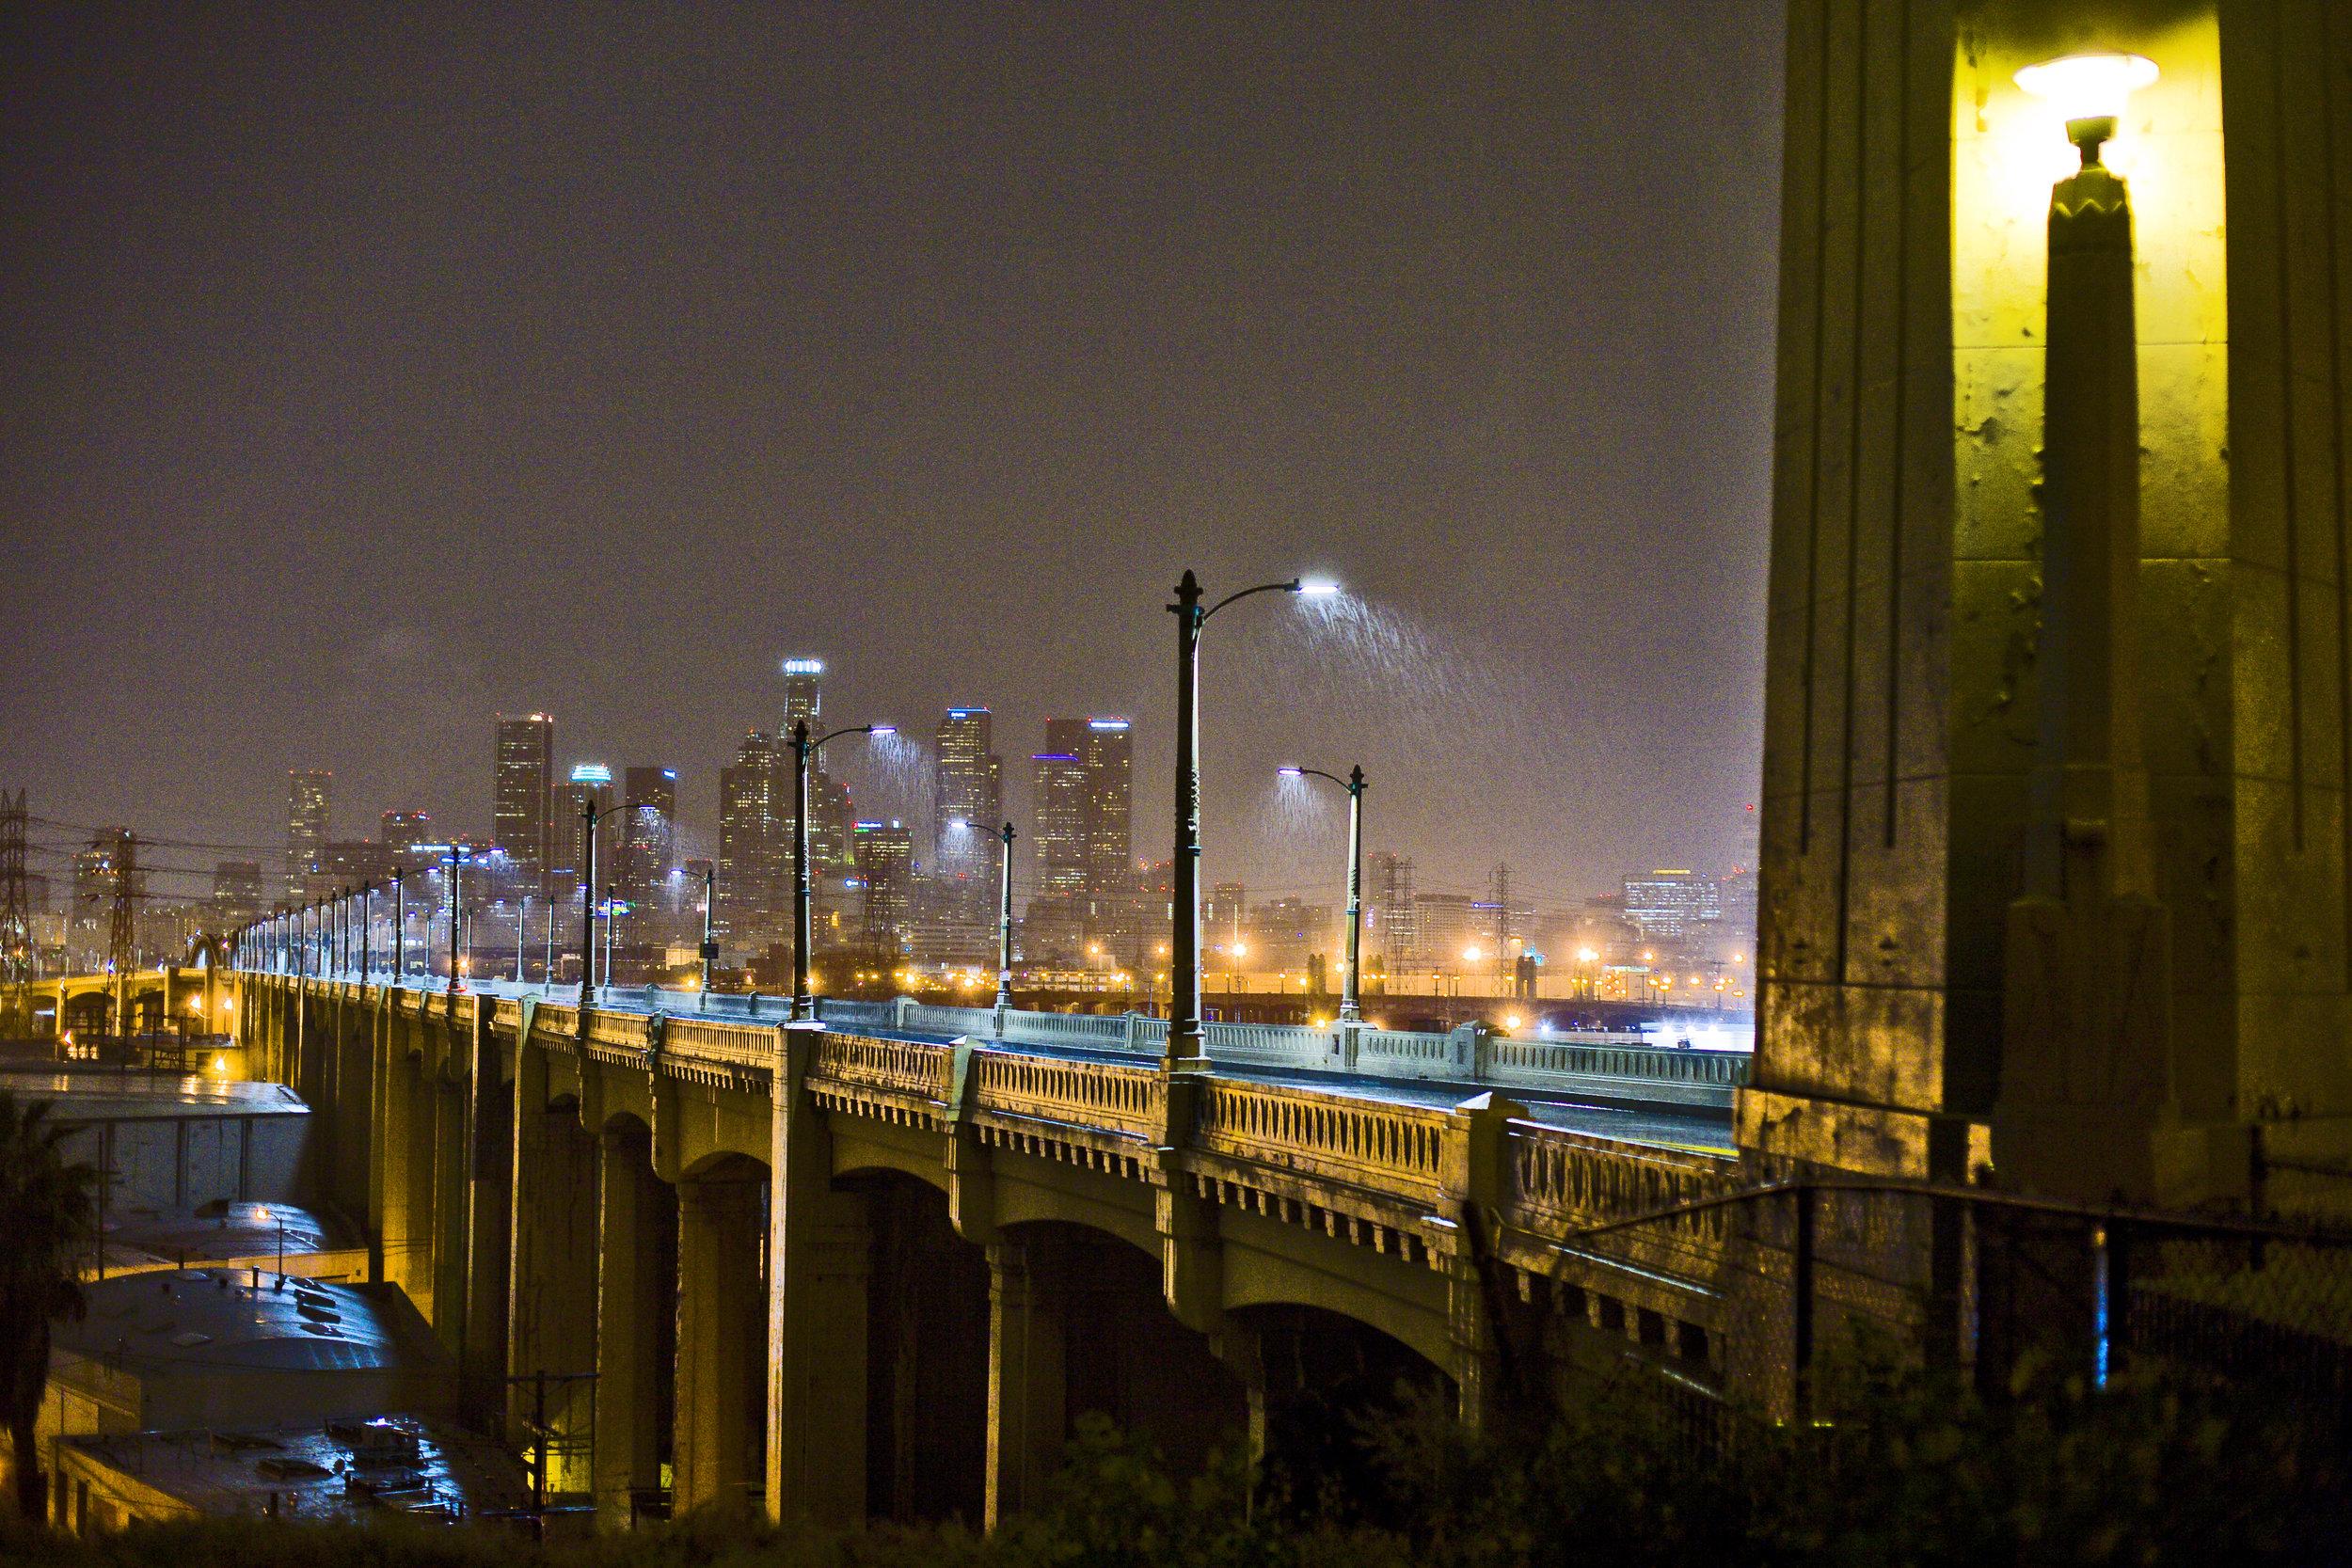 Night rain 6th Street bridge